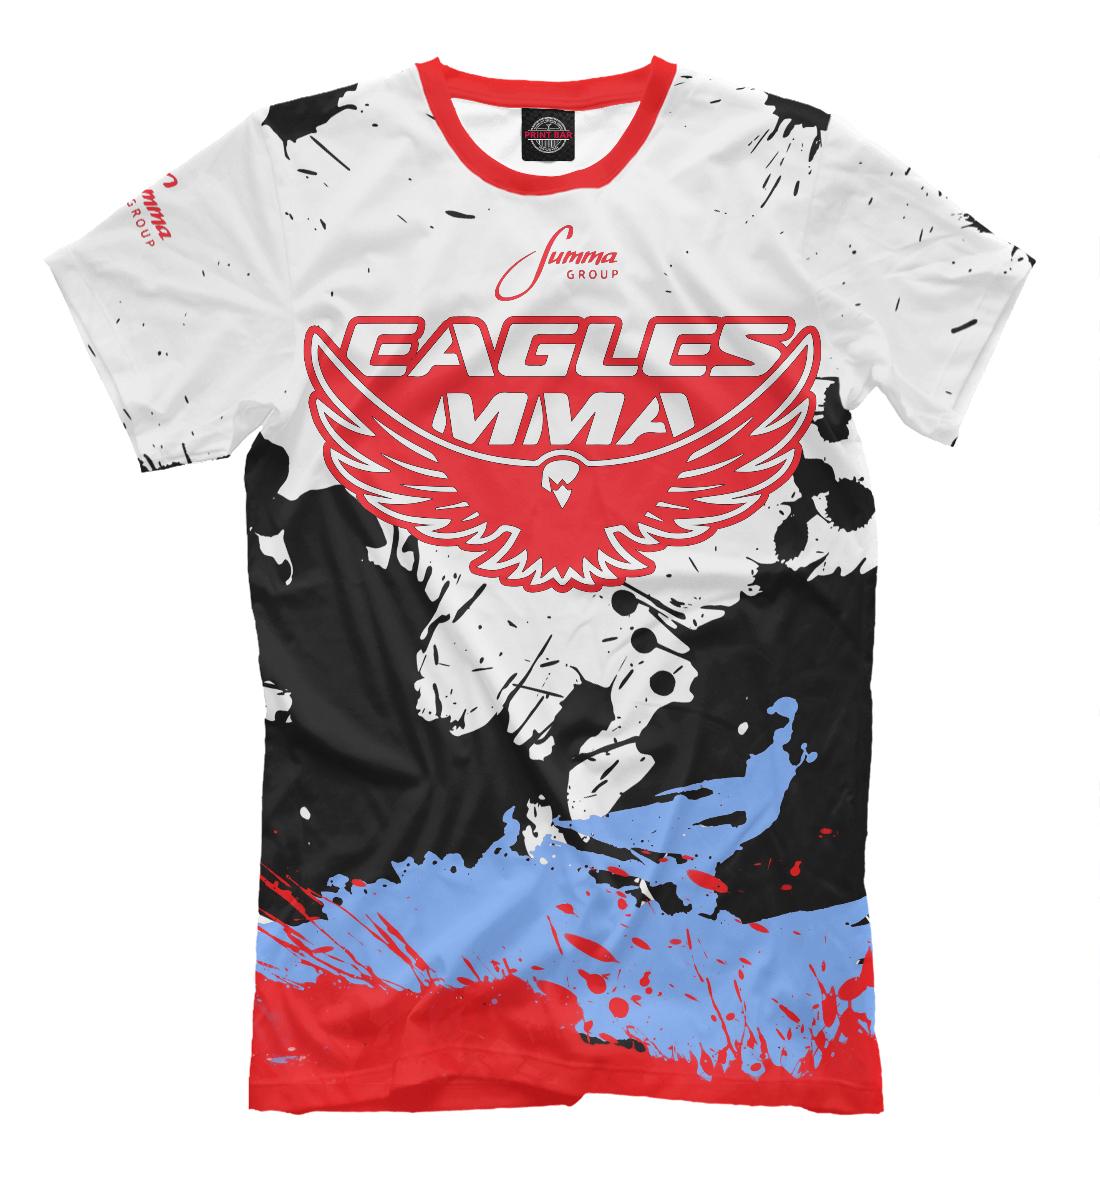 Eagles MMA Khabib Nurmagomedov